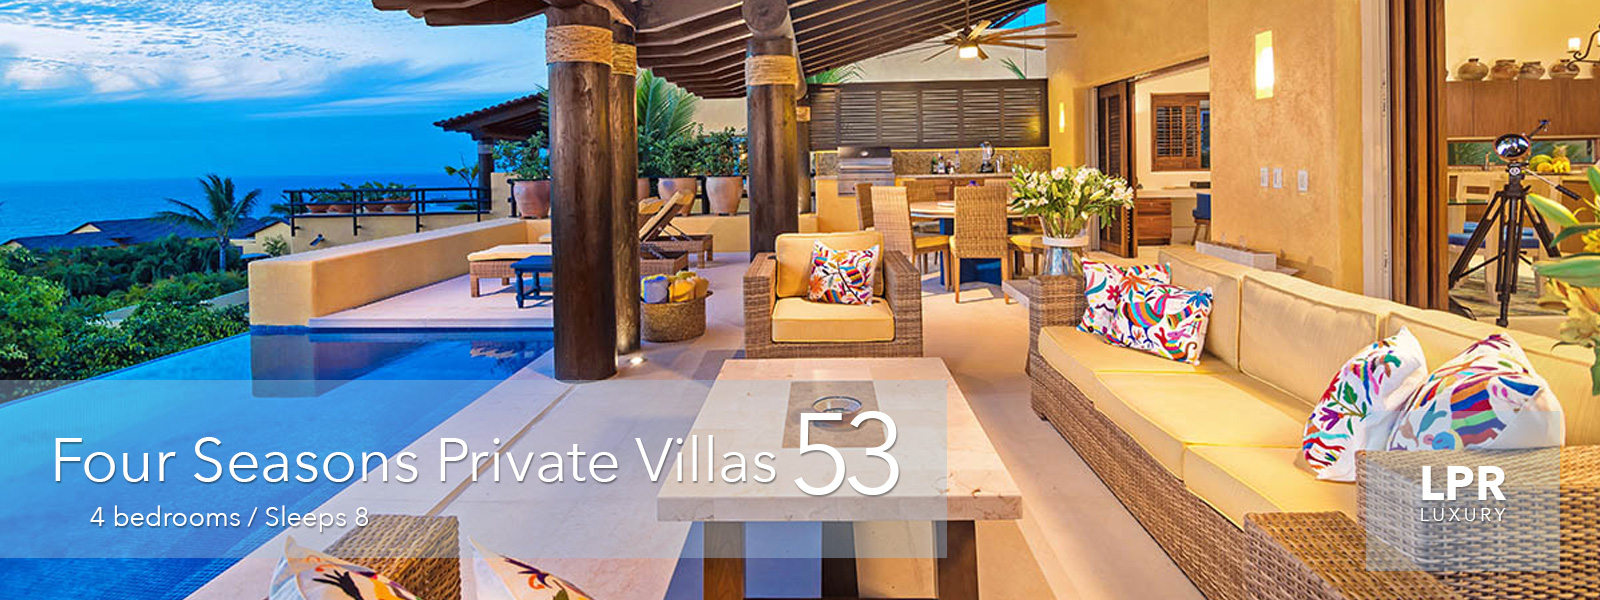 Four Seasons Private Villa 53 - Luxury Punta Mita Resort Vacation rental villa - Four Seasons Resort, Punta Mita Mexico